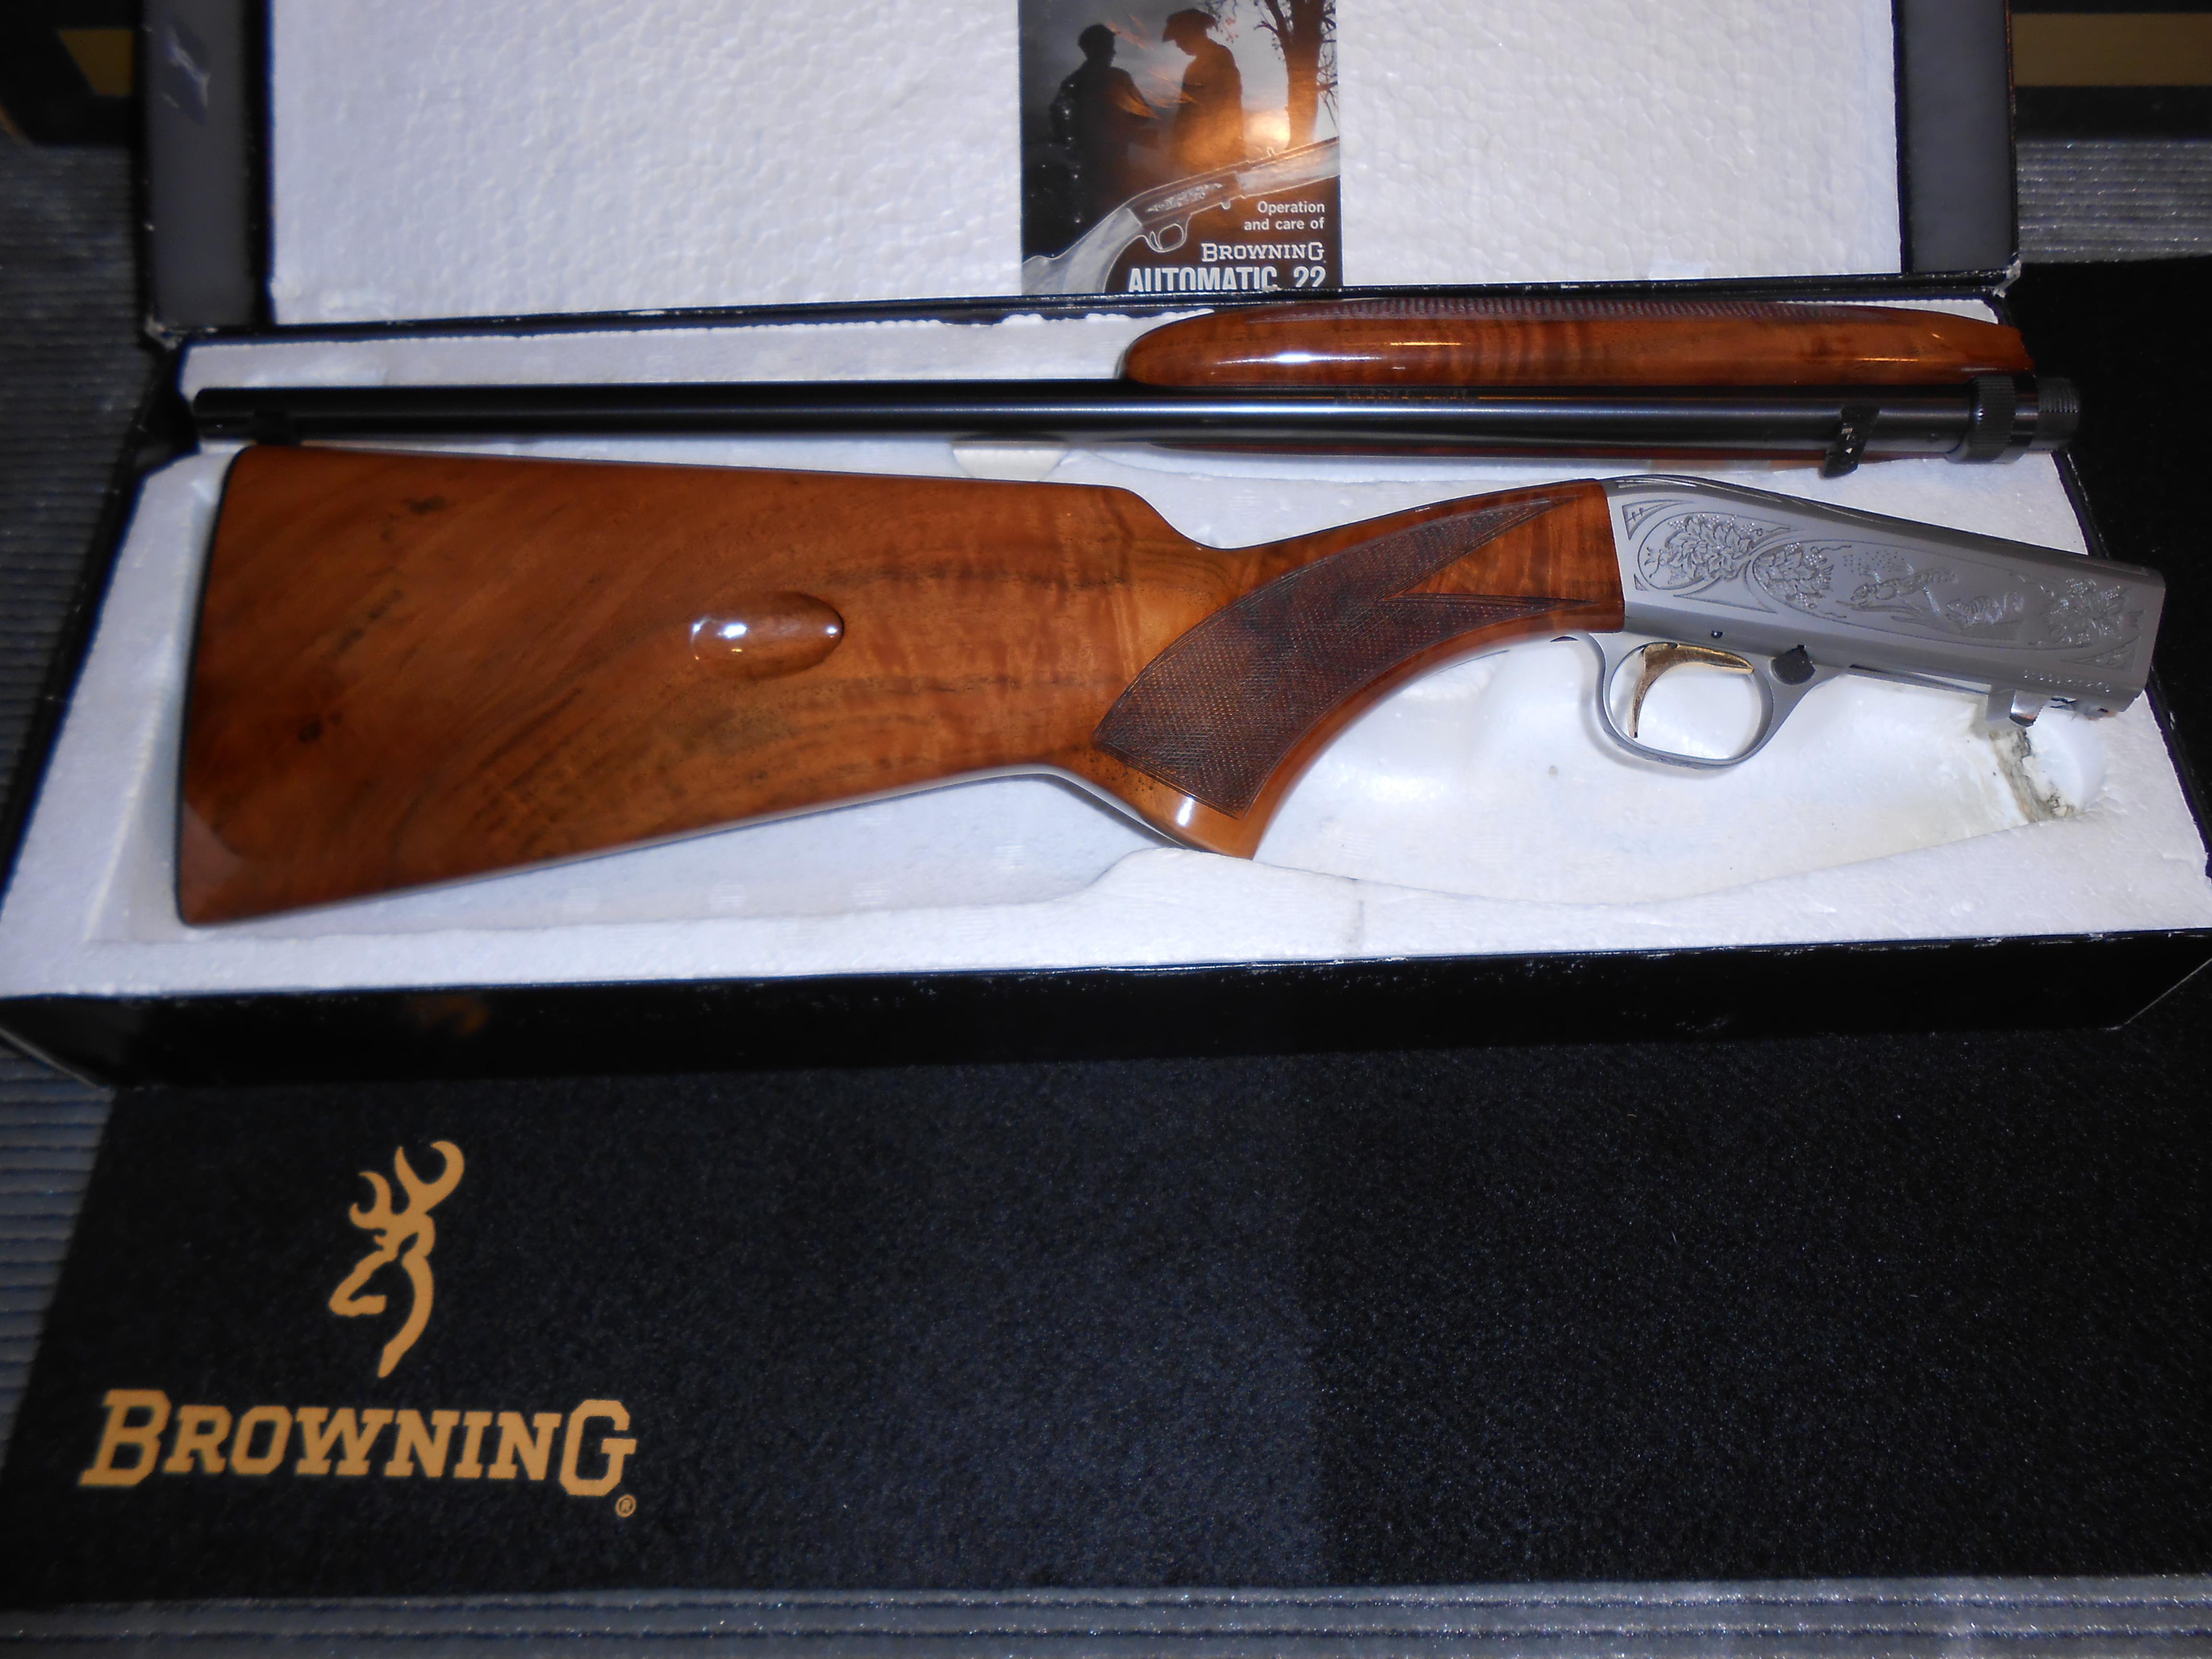 Unfired Grade 2 Browning ATD 22Lr  Miroku  Guns > Rifles > Browning Rifles > Semi Auto > Hunting